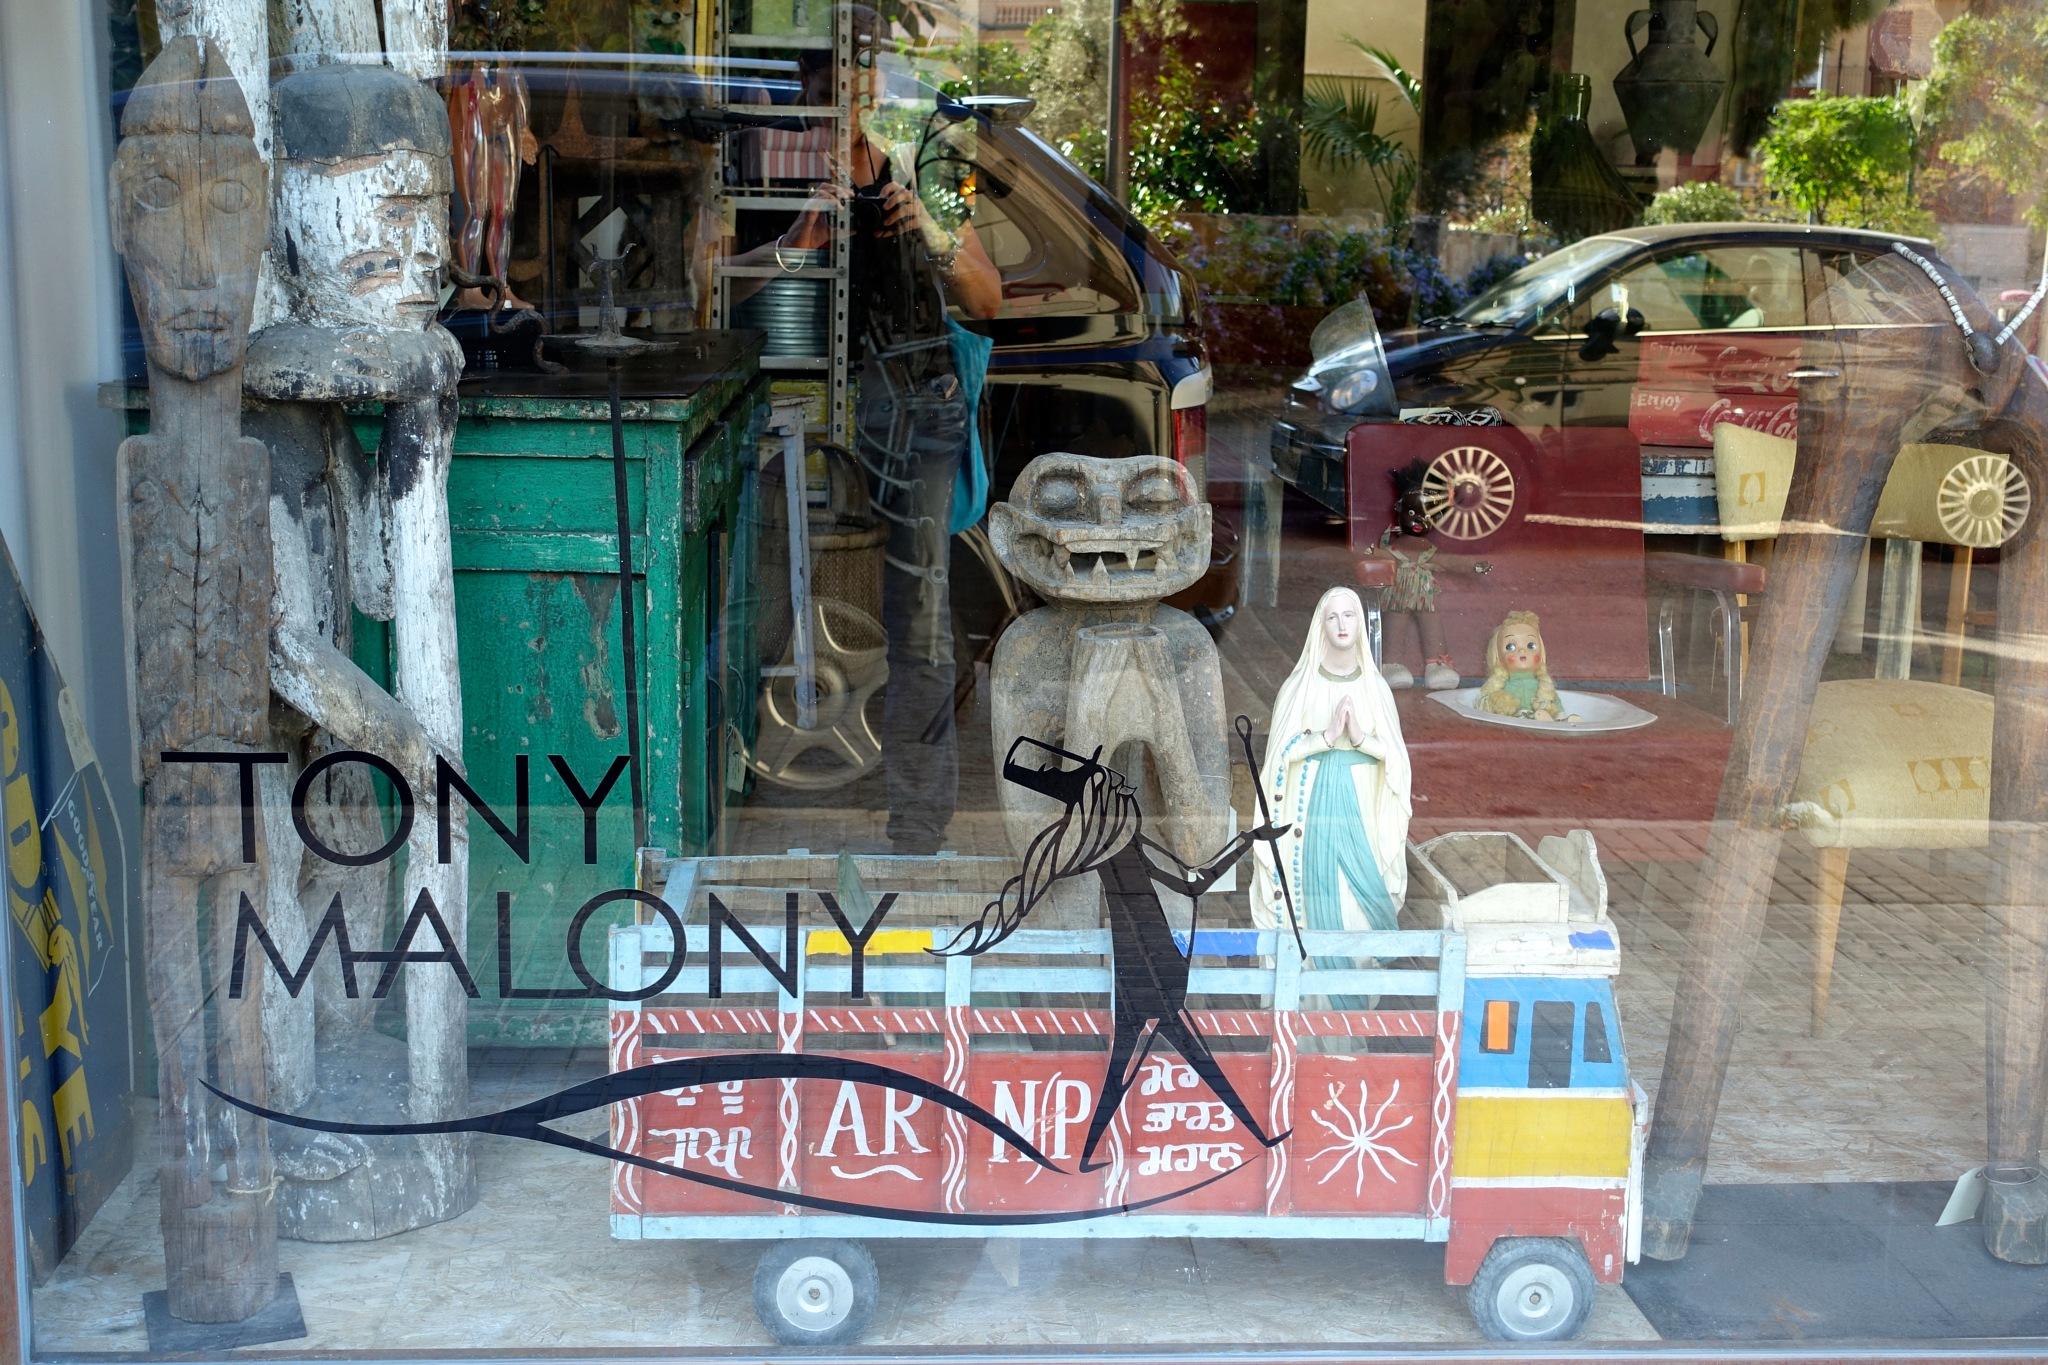 shop window in Santa Catalina, Palma by m.etemadieh